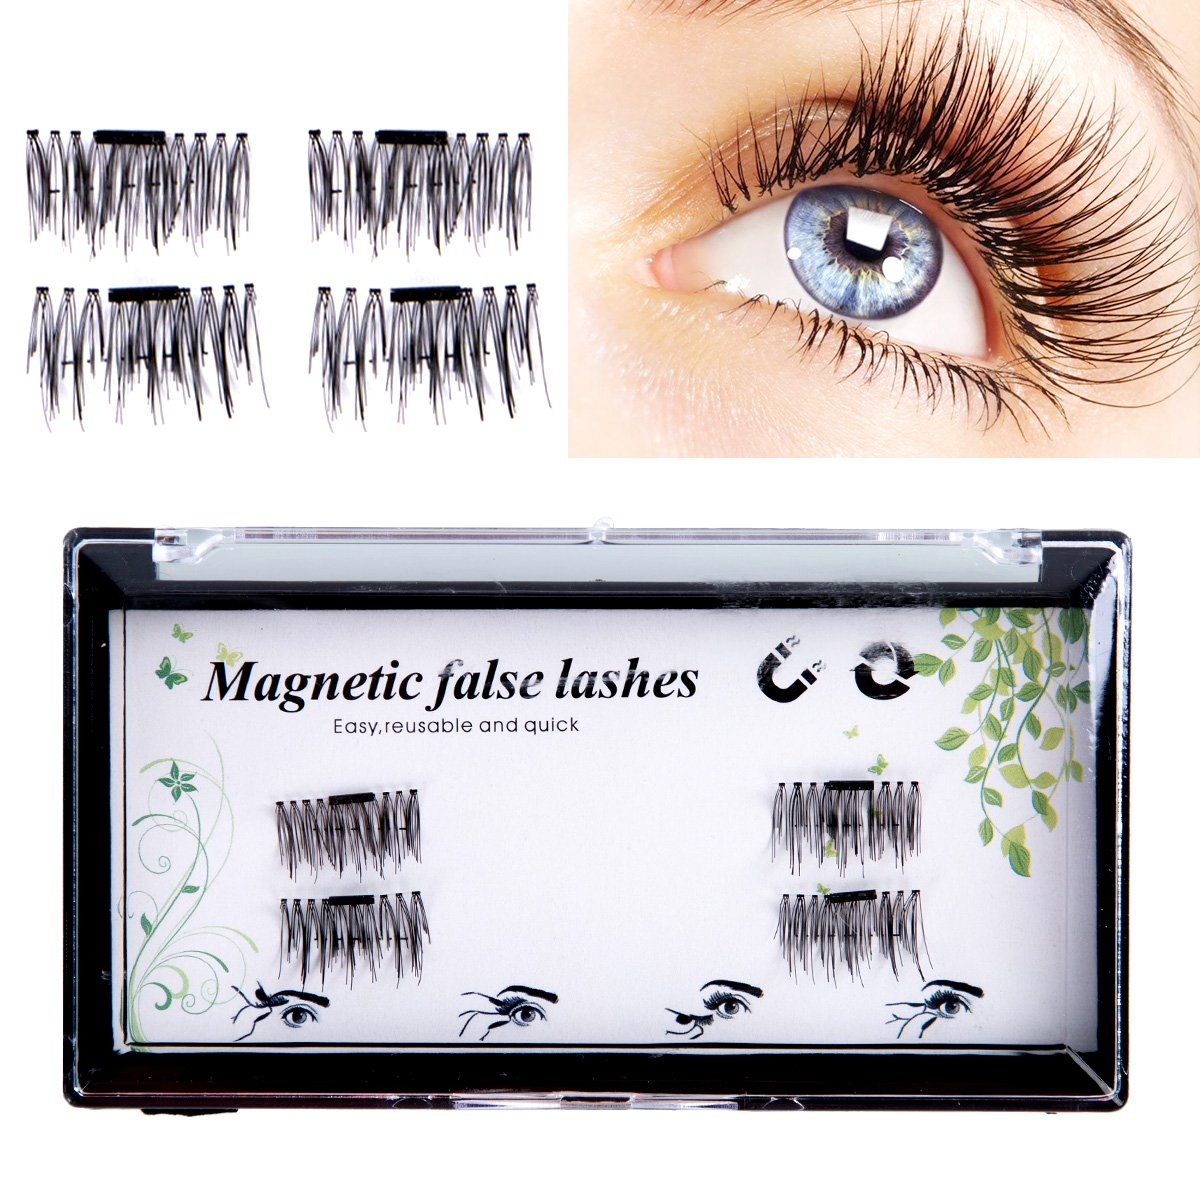 e1695cd0f35 Get Quotations · [FBA NEWEST VERSION] False Magnetic Eyelashes 3D Reusable  Fake Eyelashes, 2 Pairs 4